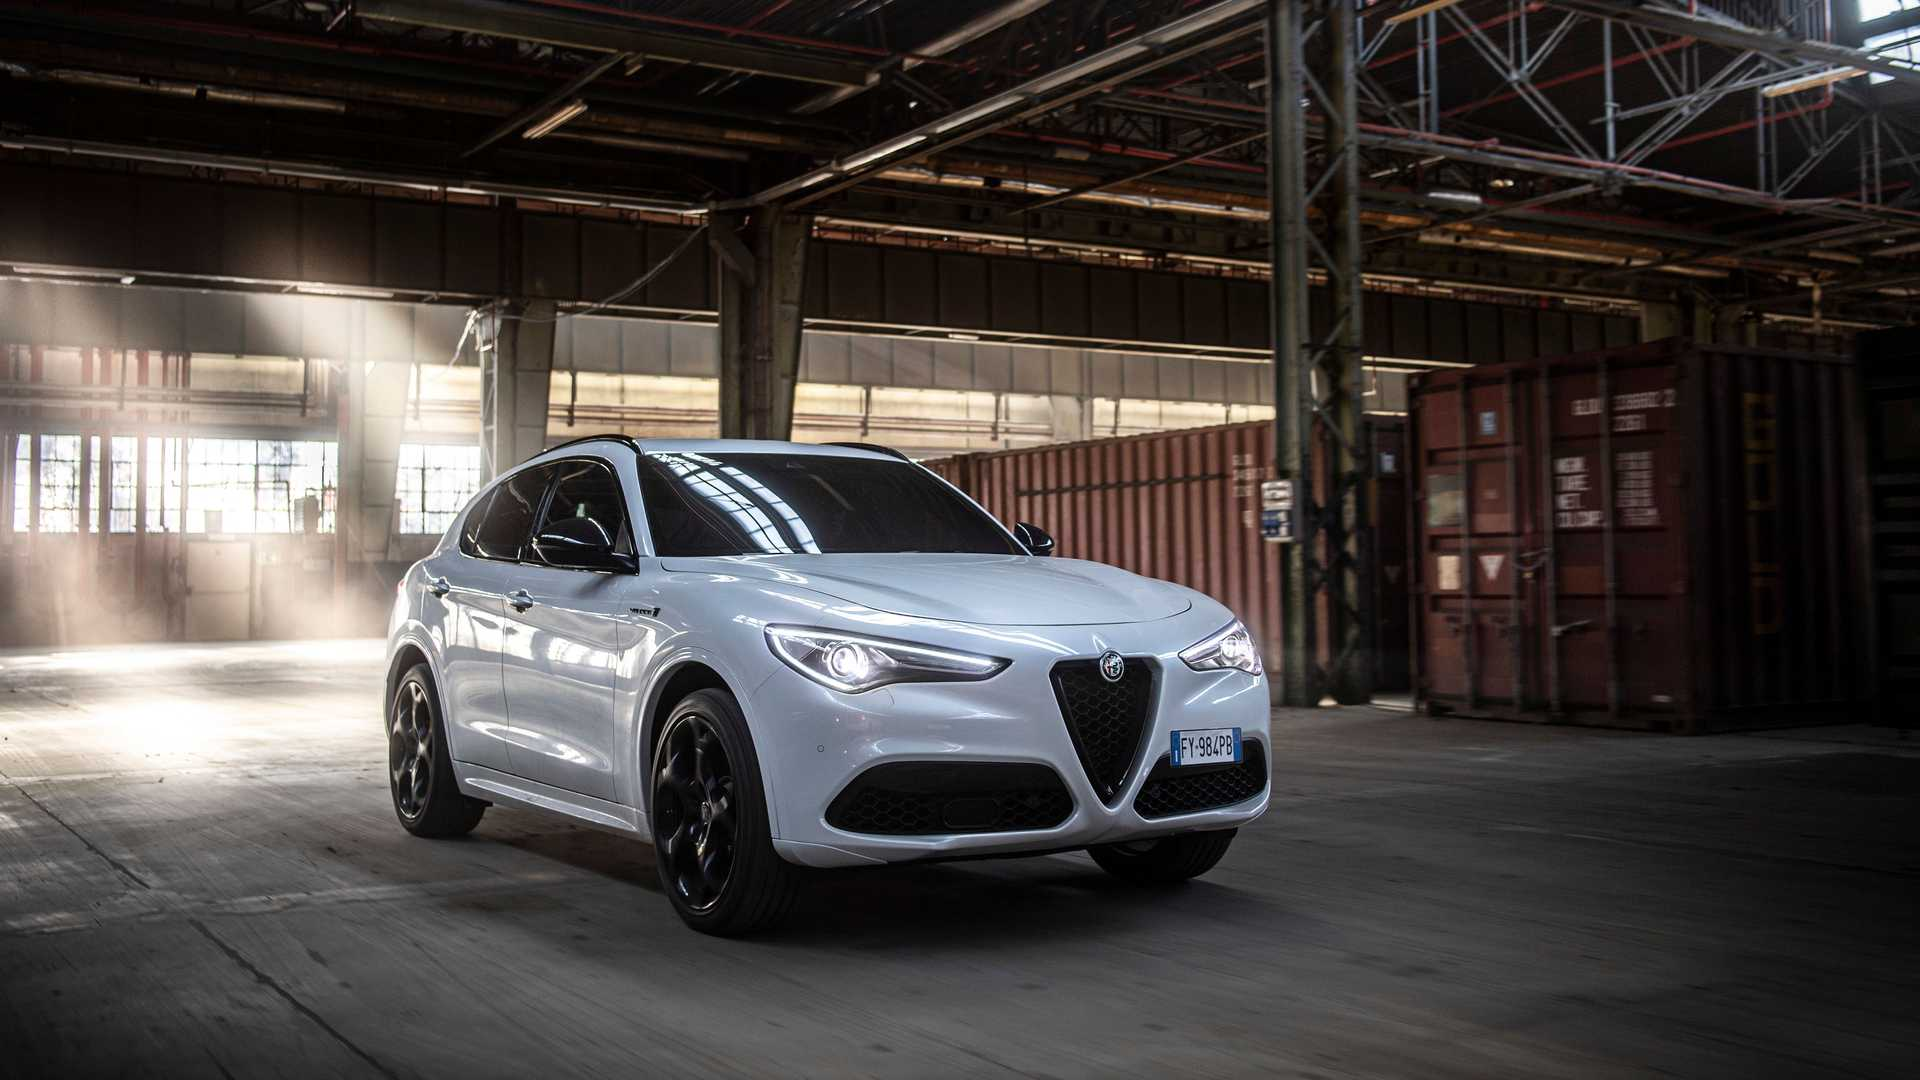 Beliebtestes Auto 2021